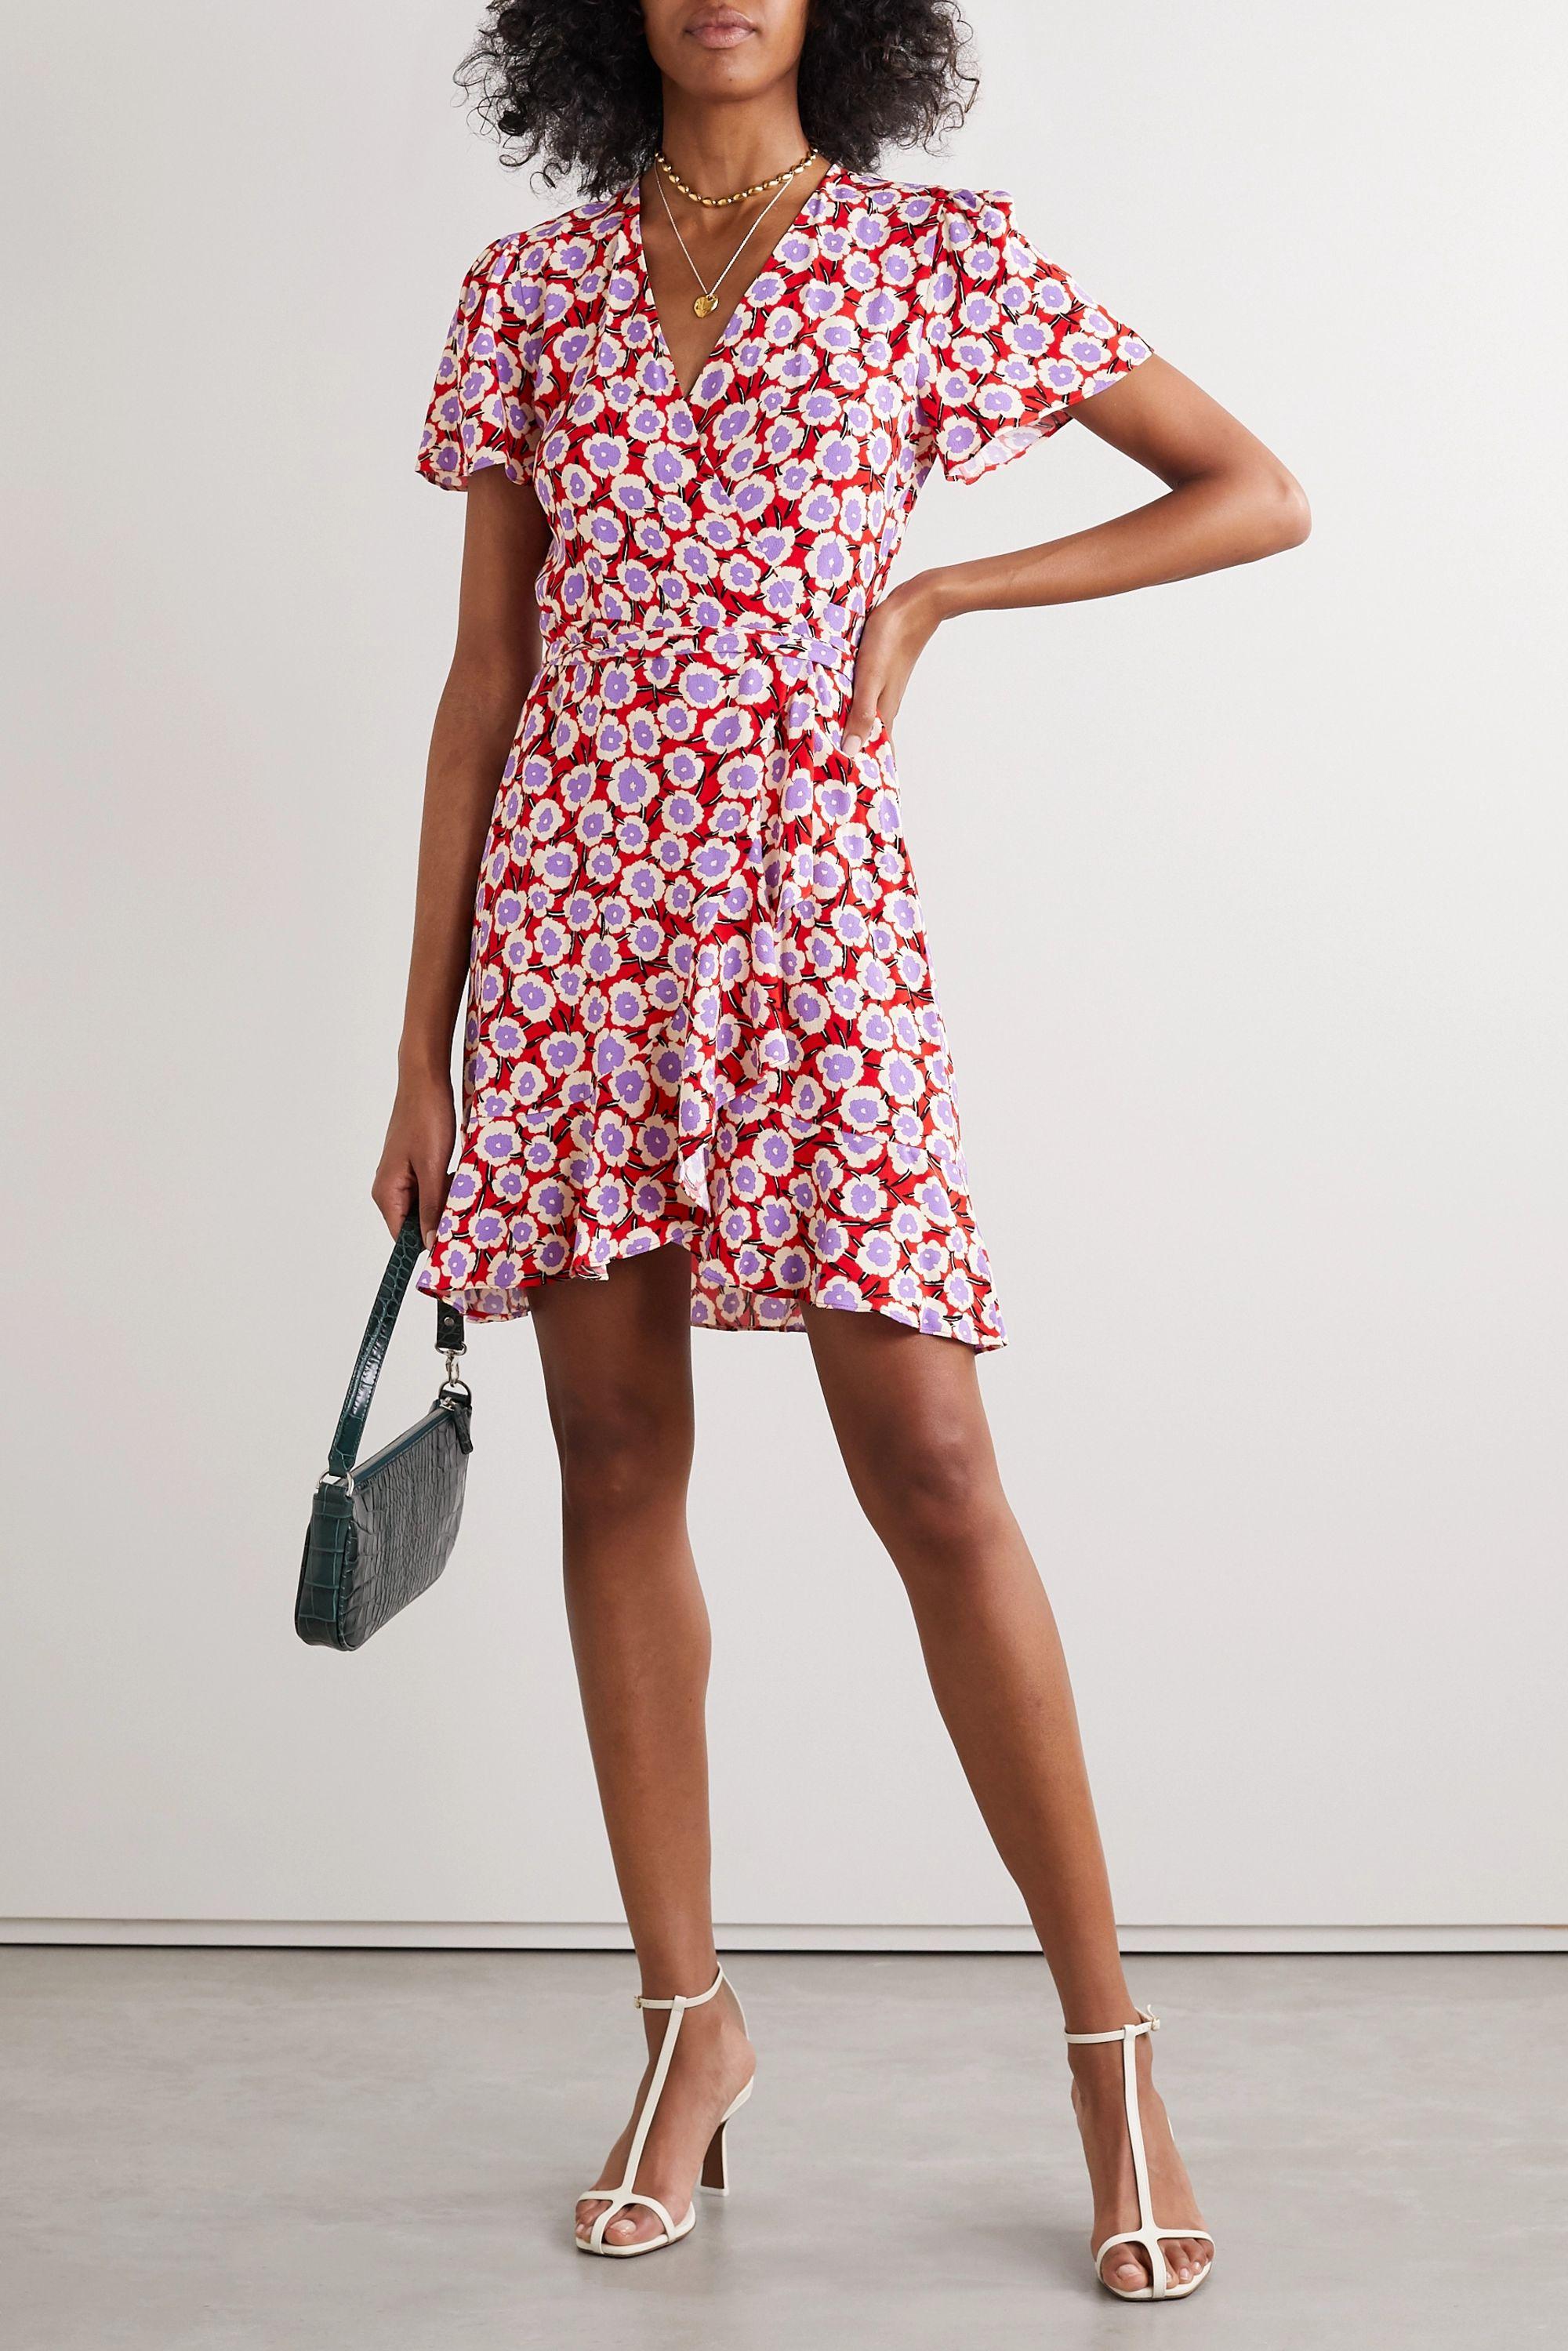 Blush Estrella Ruffled Floral Print Crepe De Chine Wrap Mini Dress Diane Von Furstenberg Net A Porter